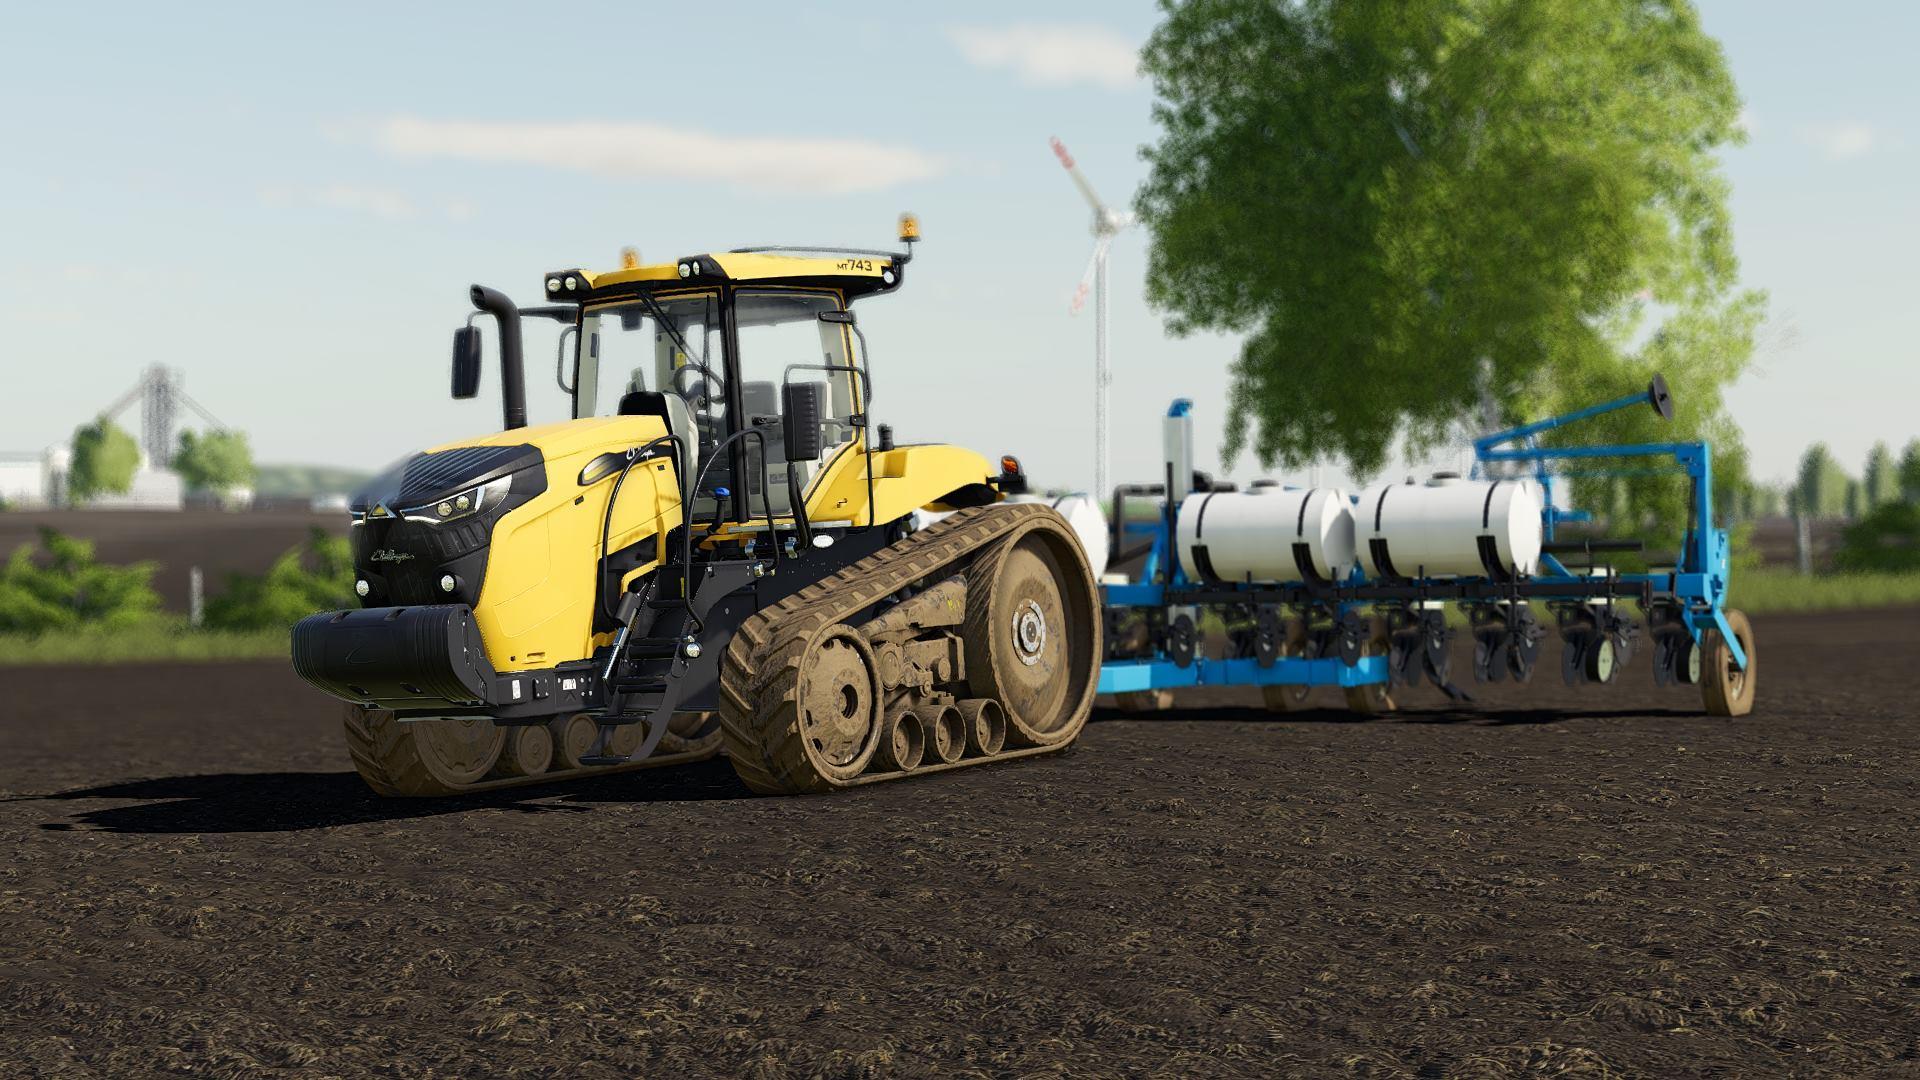 Challenger MT700 US v1 0 FS19 - Farming Simulator 19 Mod